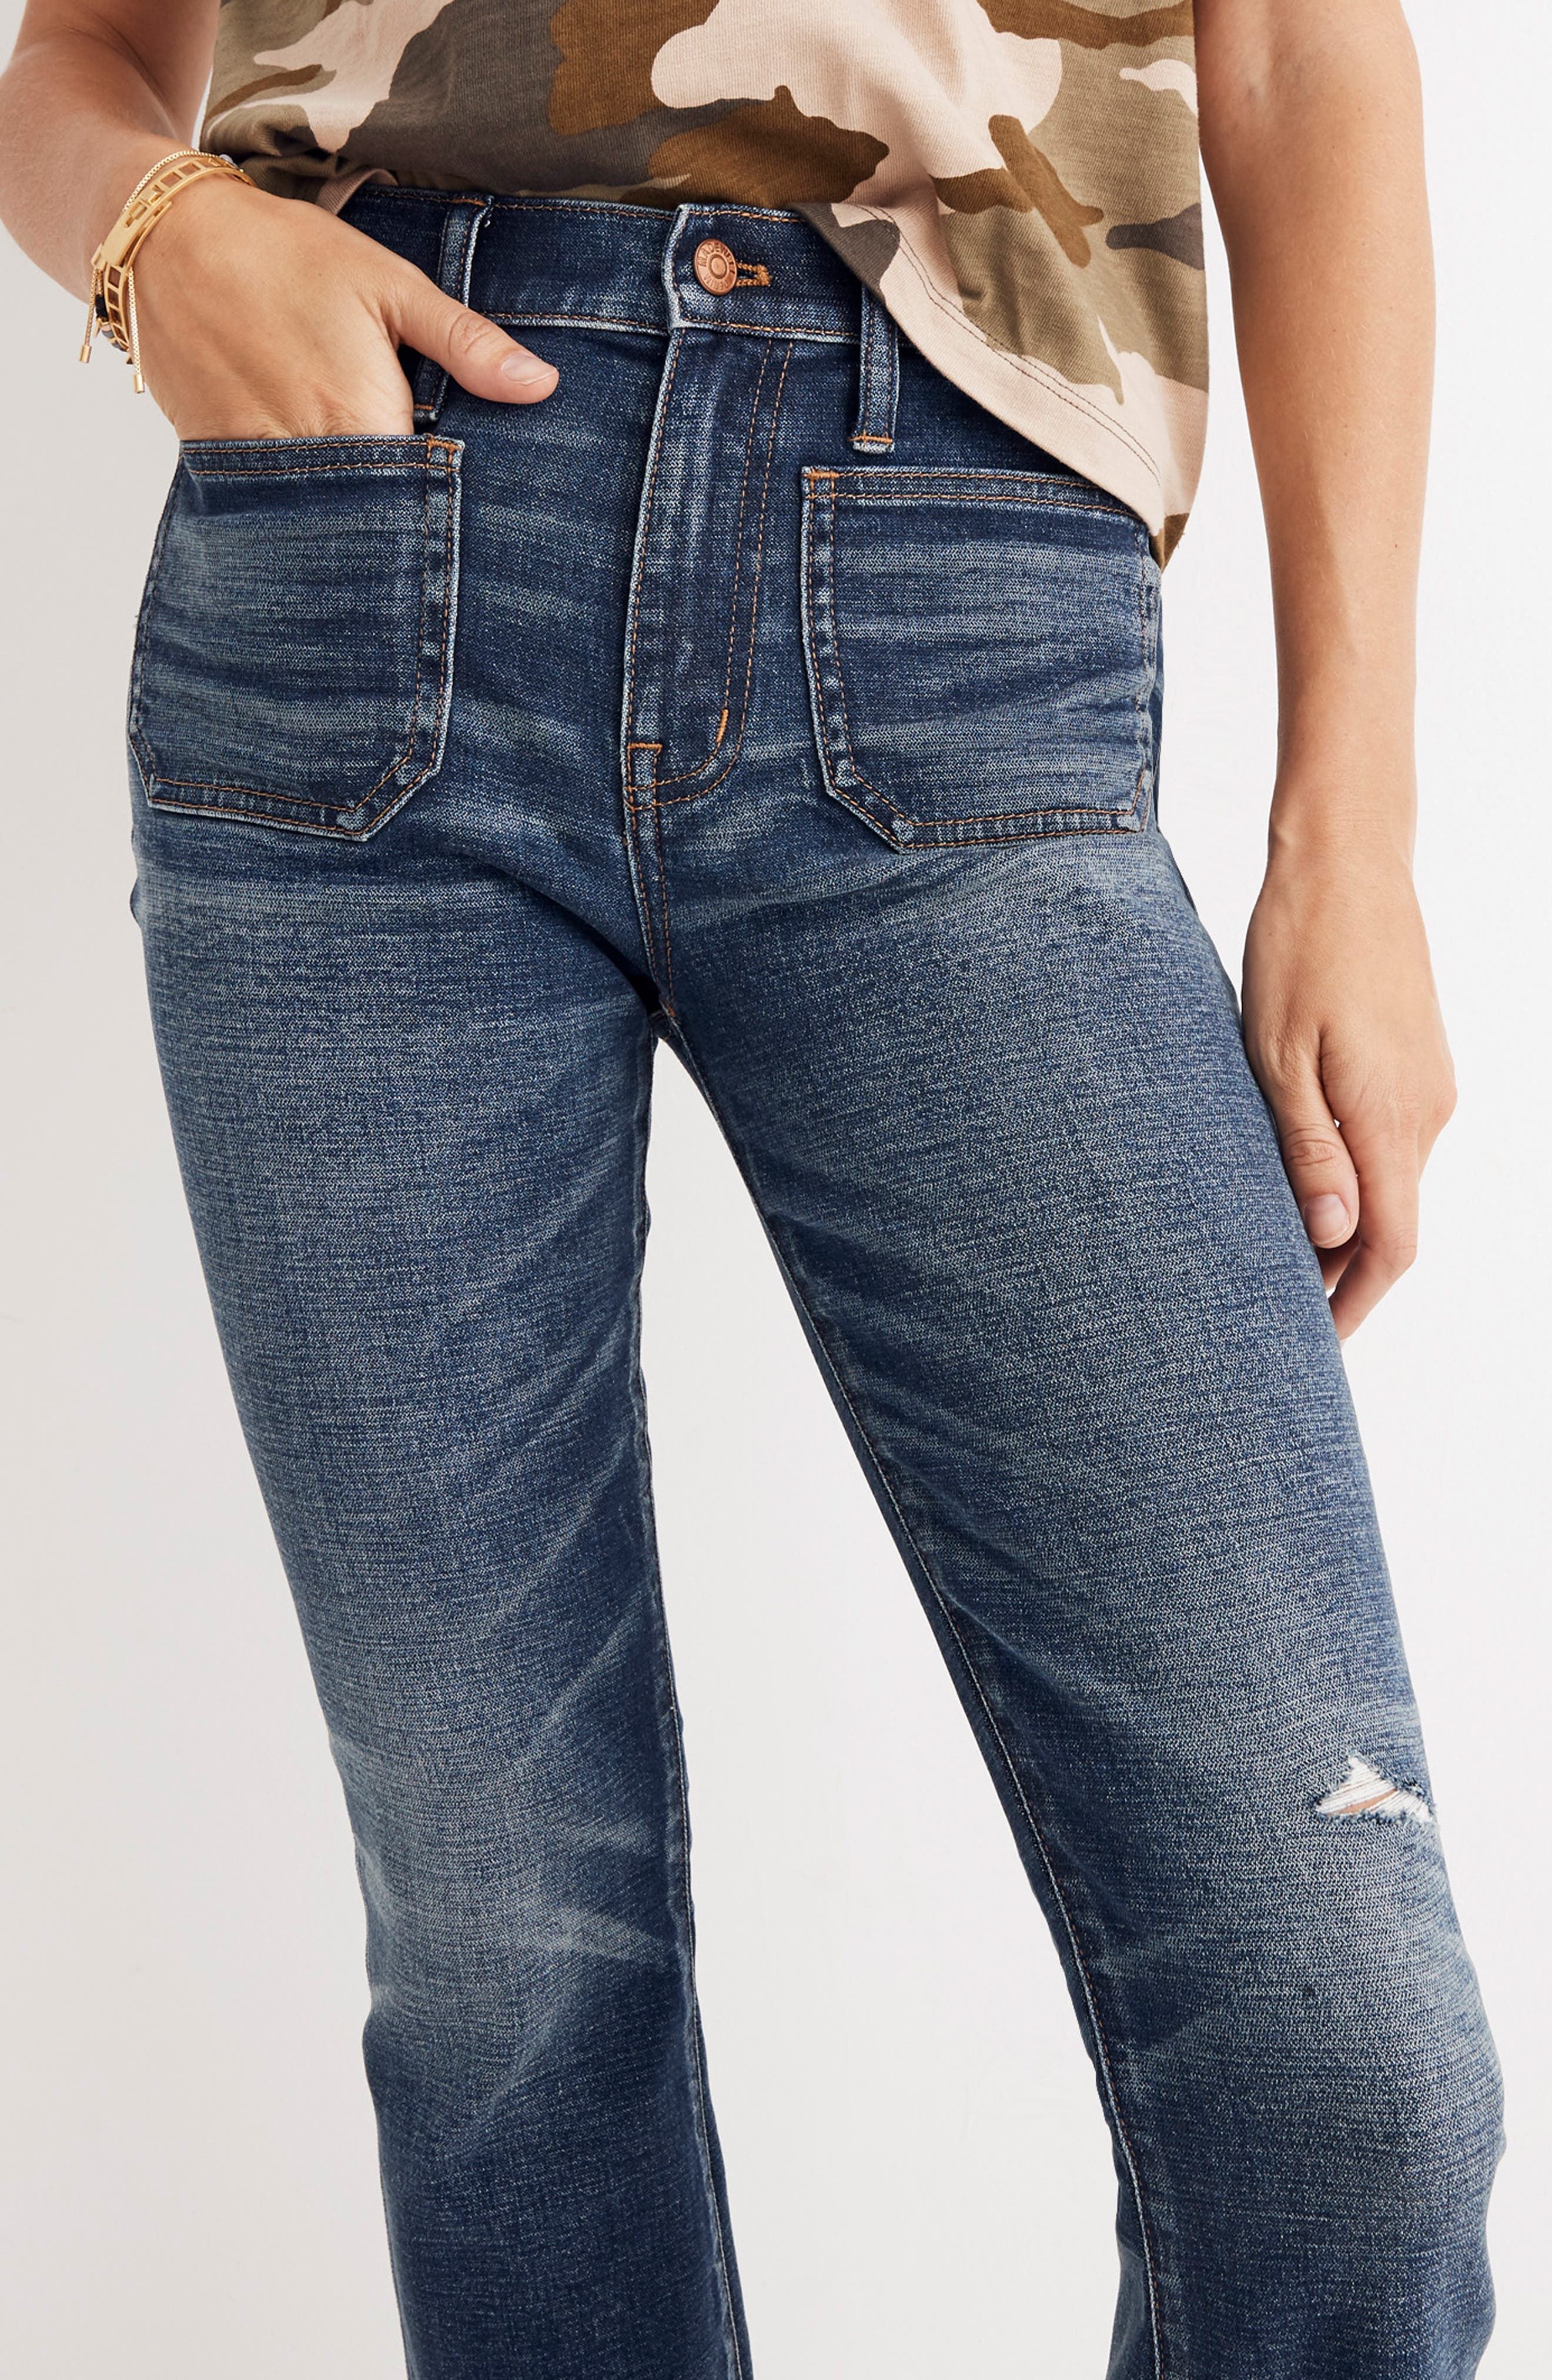 Cali Patch Pocket High Waist Demi Boot Jeans,                             Alternate thumbnail 6, color,                             DERMOTT